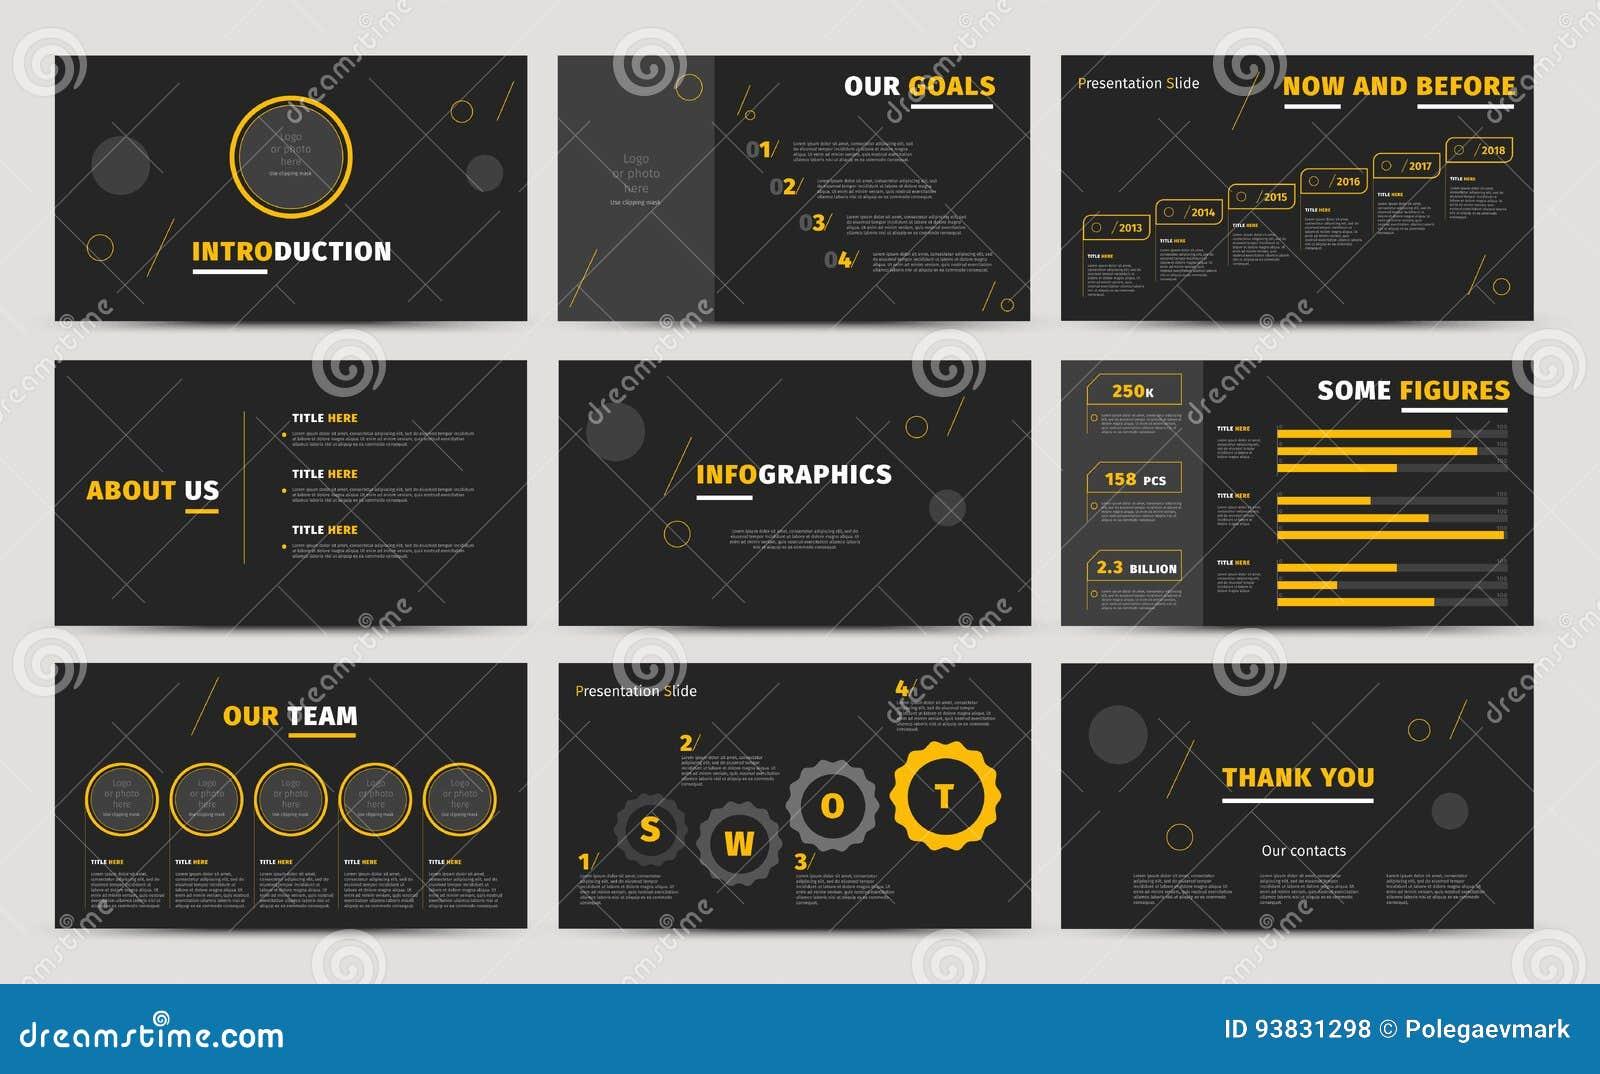 Corporate Presentation Slides Design Creative Business